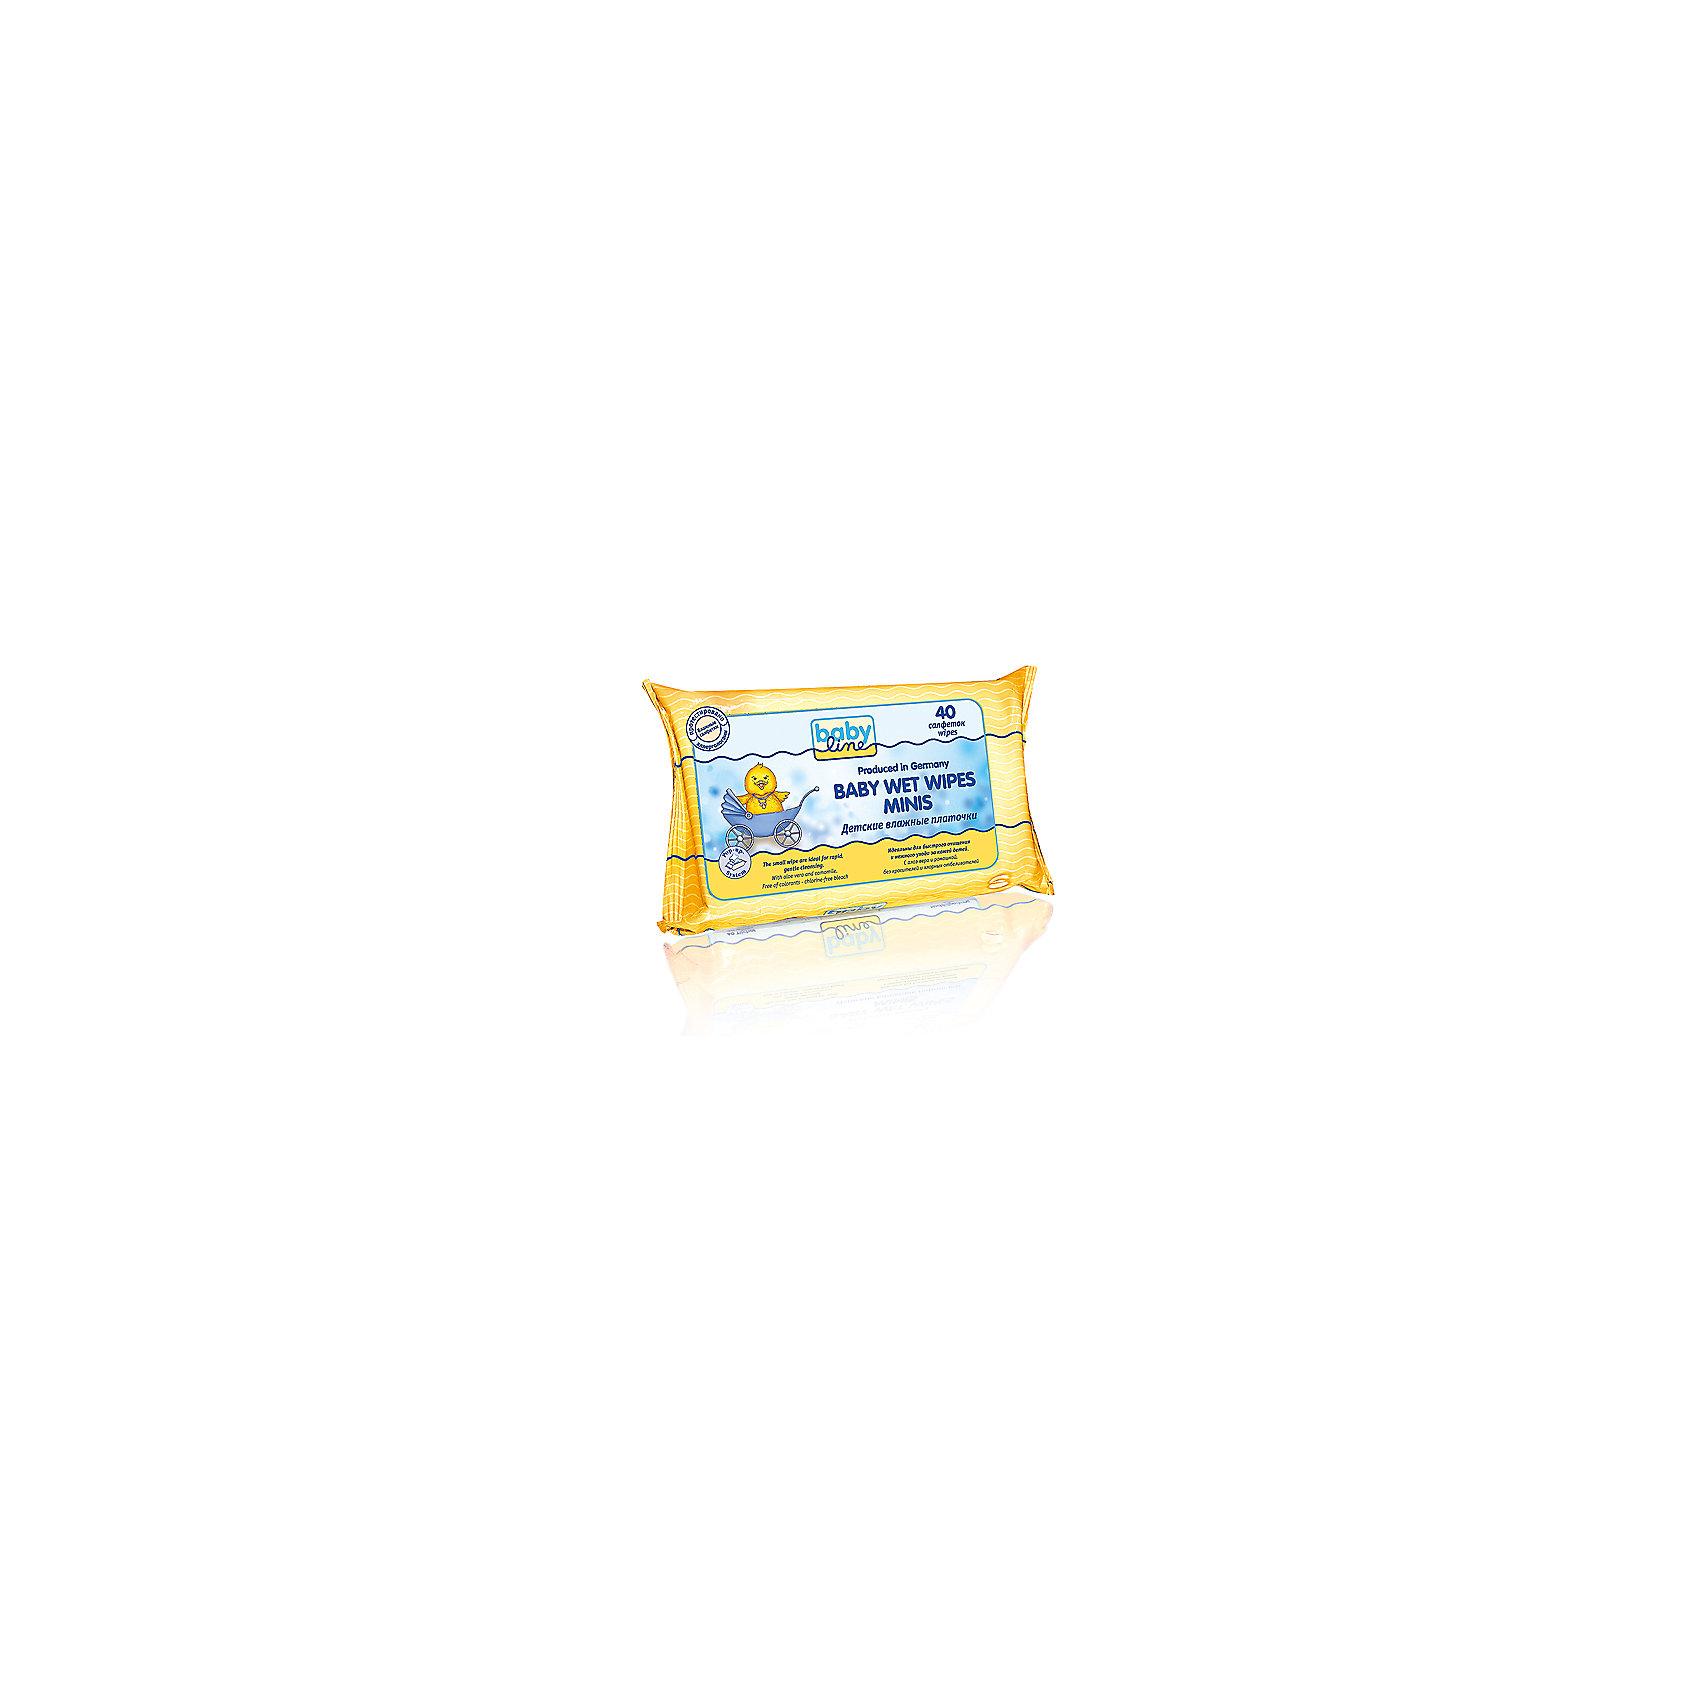 Влажные салфетки Комфорт mini, 40 шт., BABYLINE (Babyline)